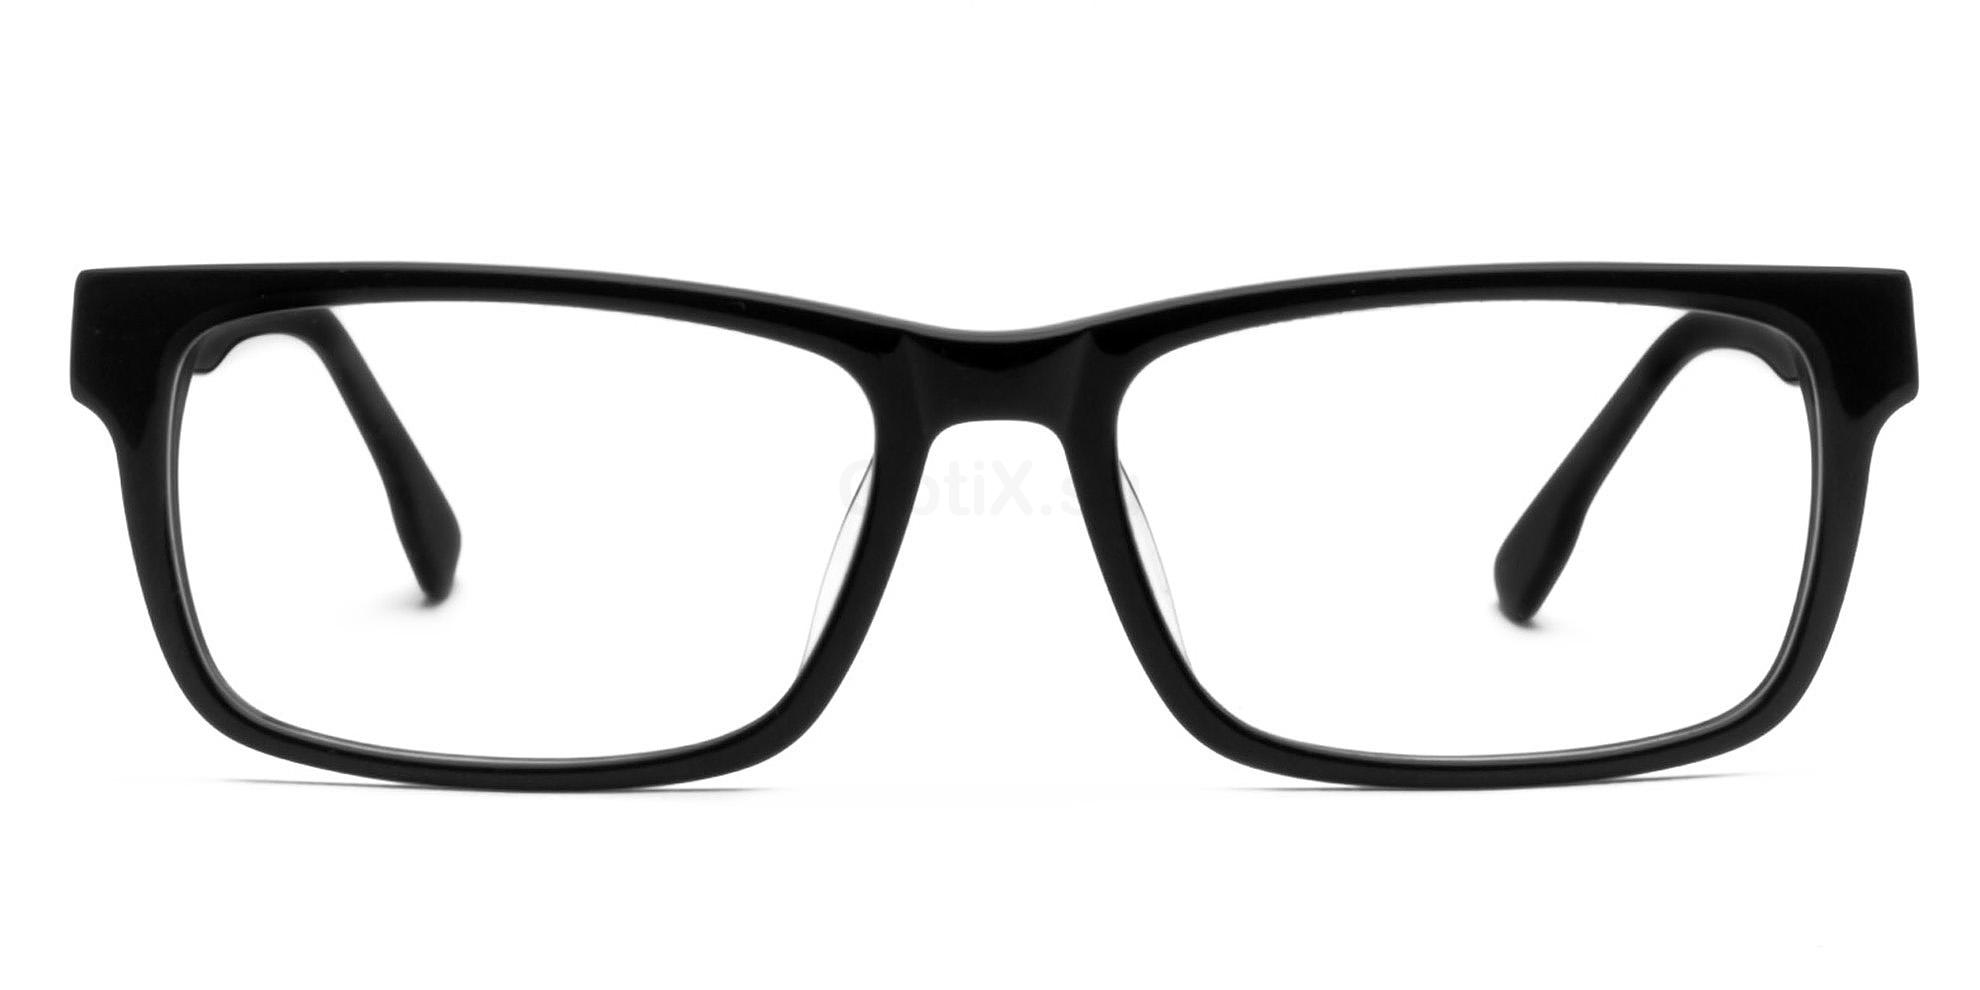 C07 HY81057 Glasses, Infinity